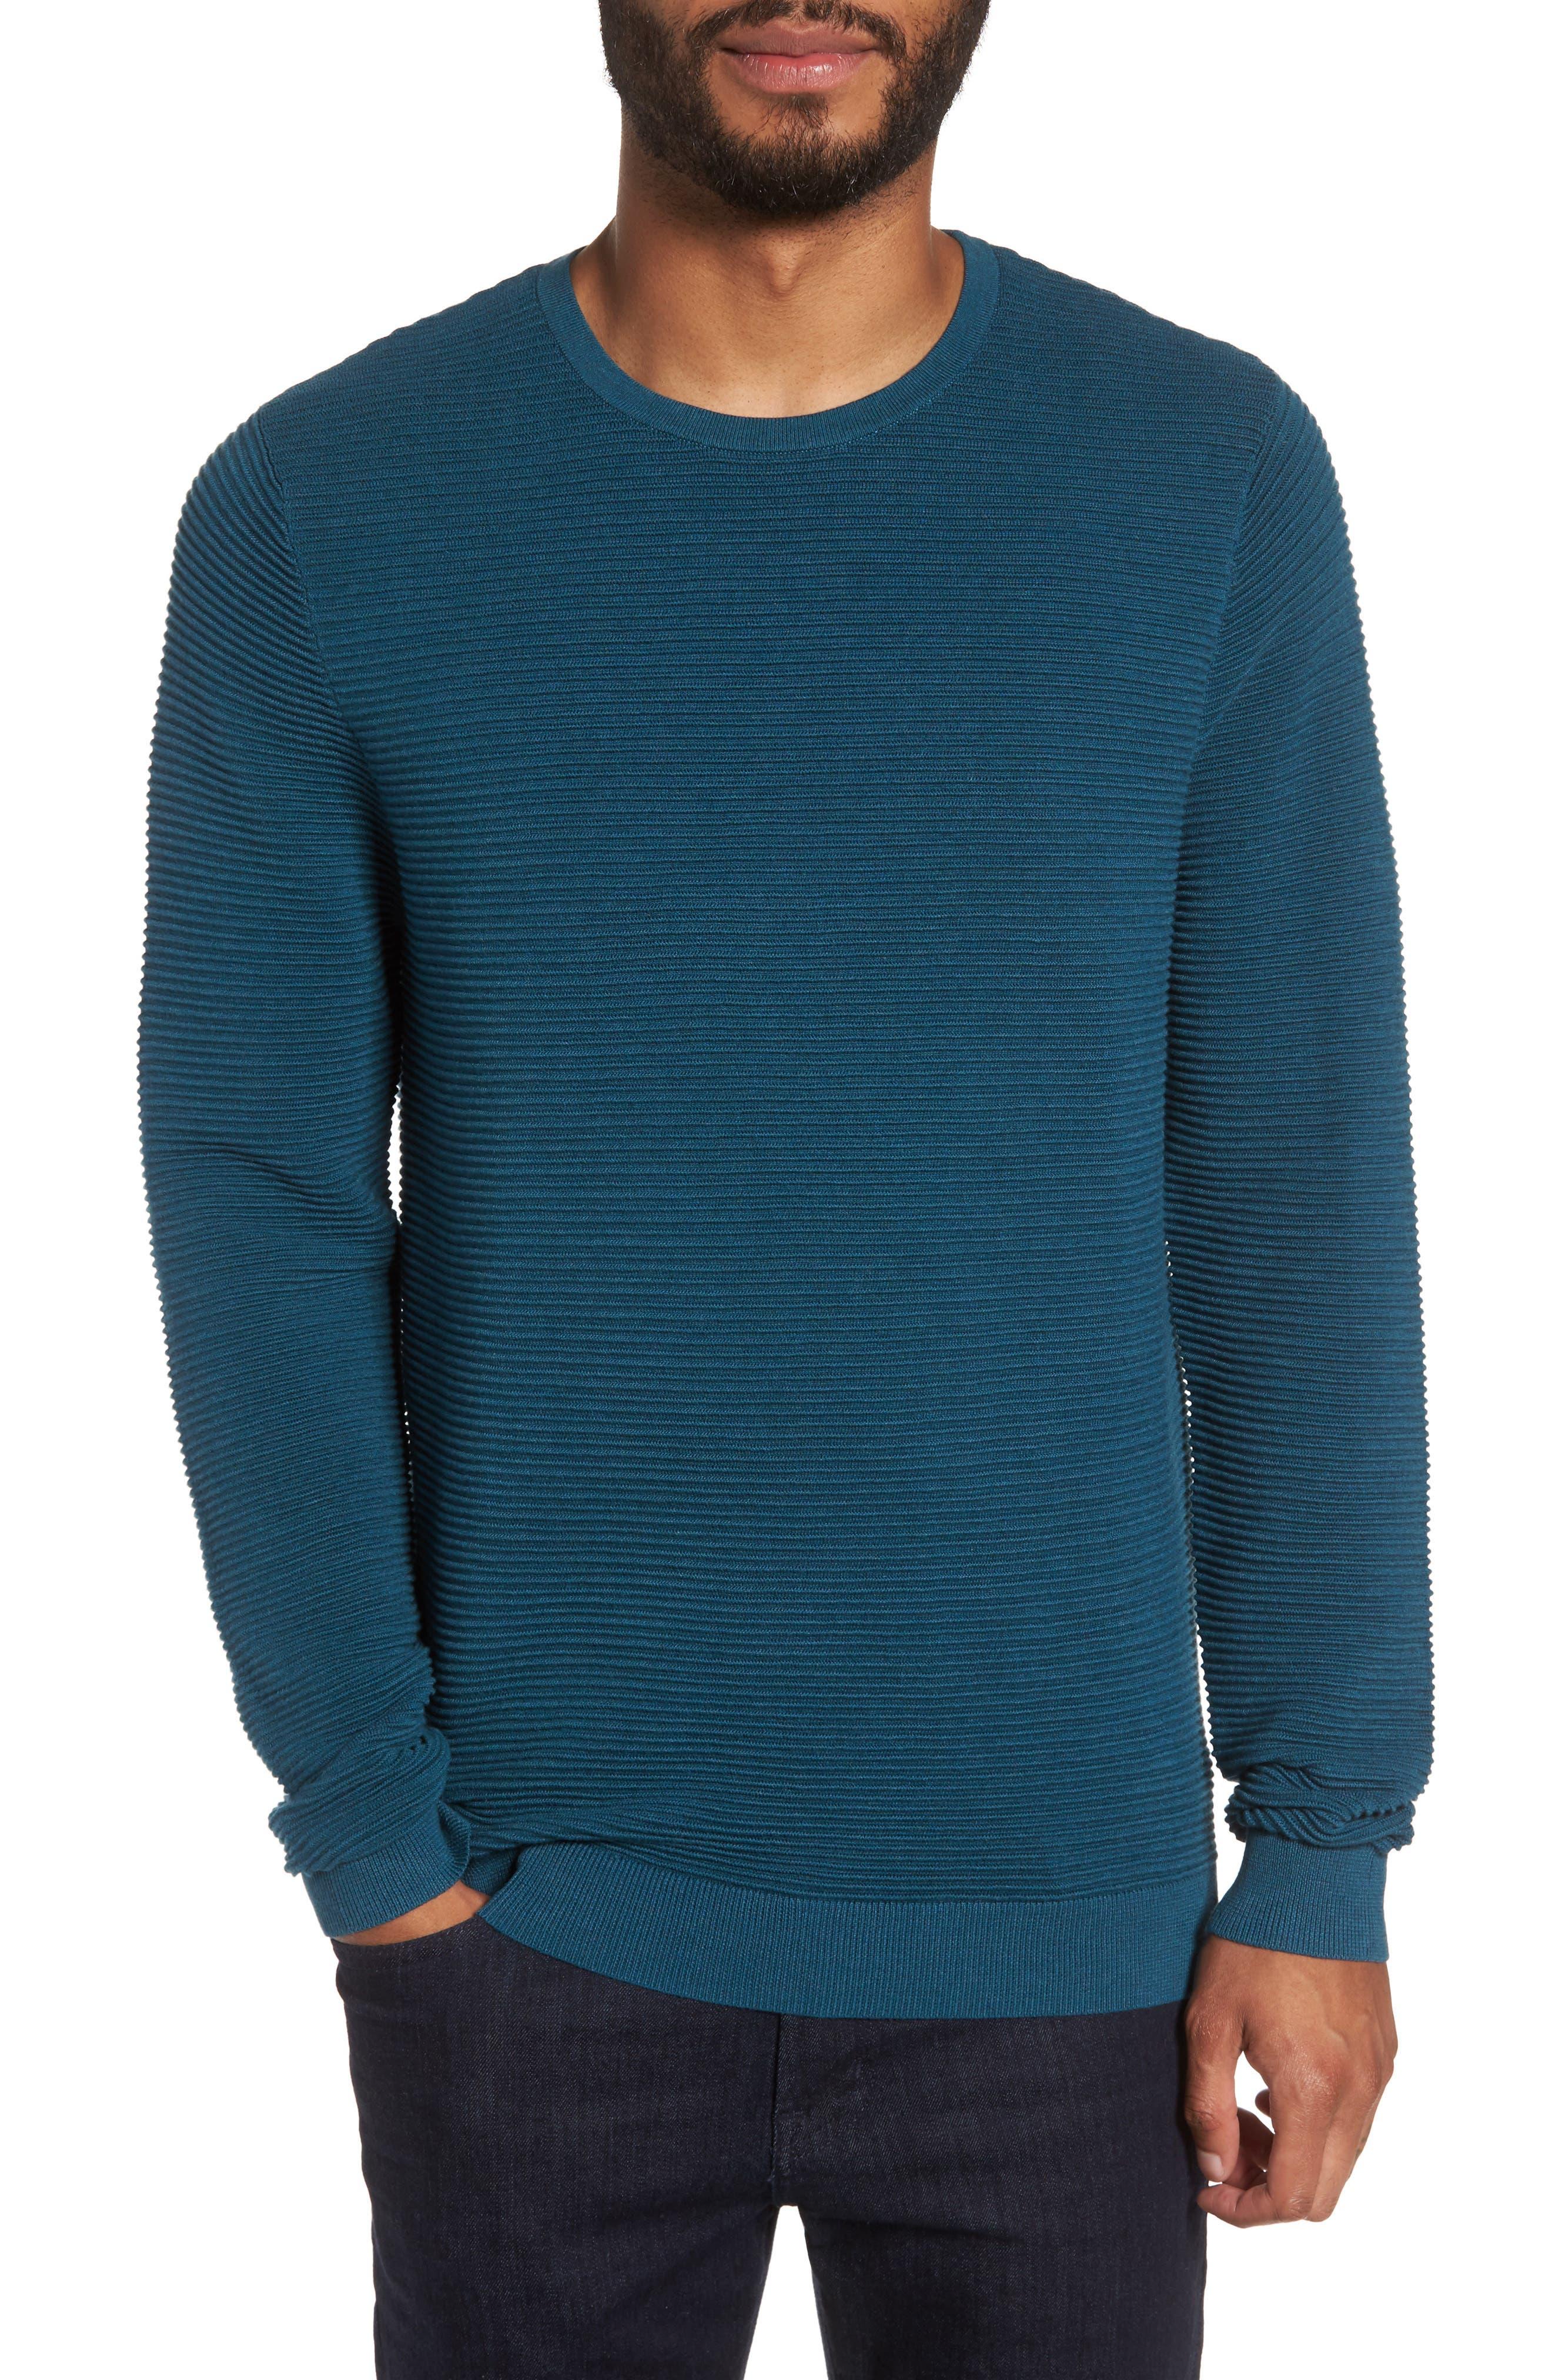 Ottoman Ribbed Crewneck Sweater,                         Main,                         color, Teal Seagate